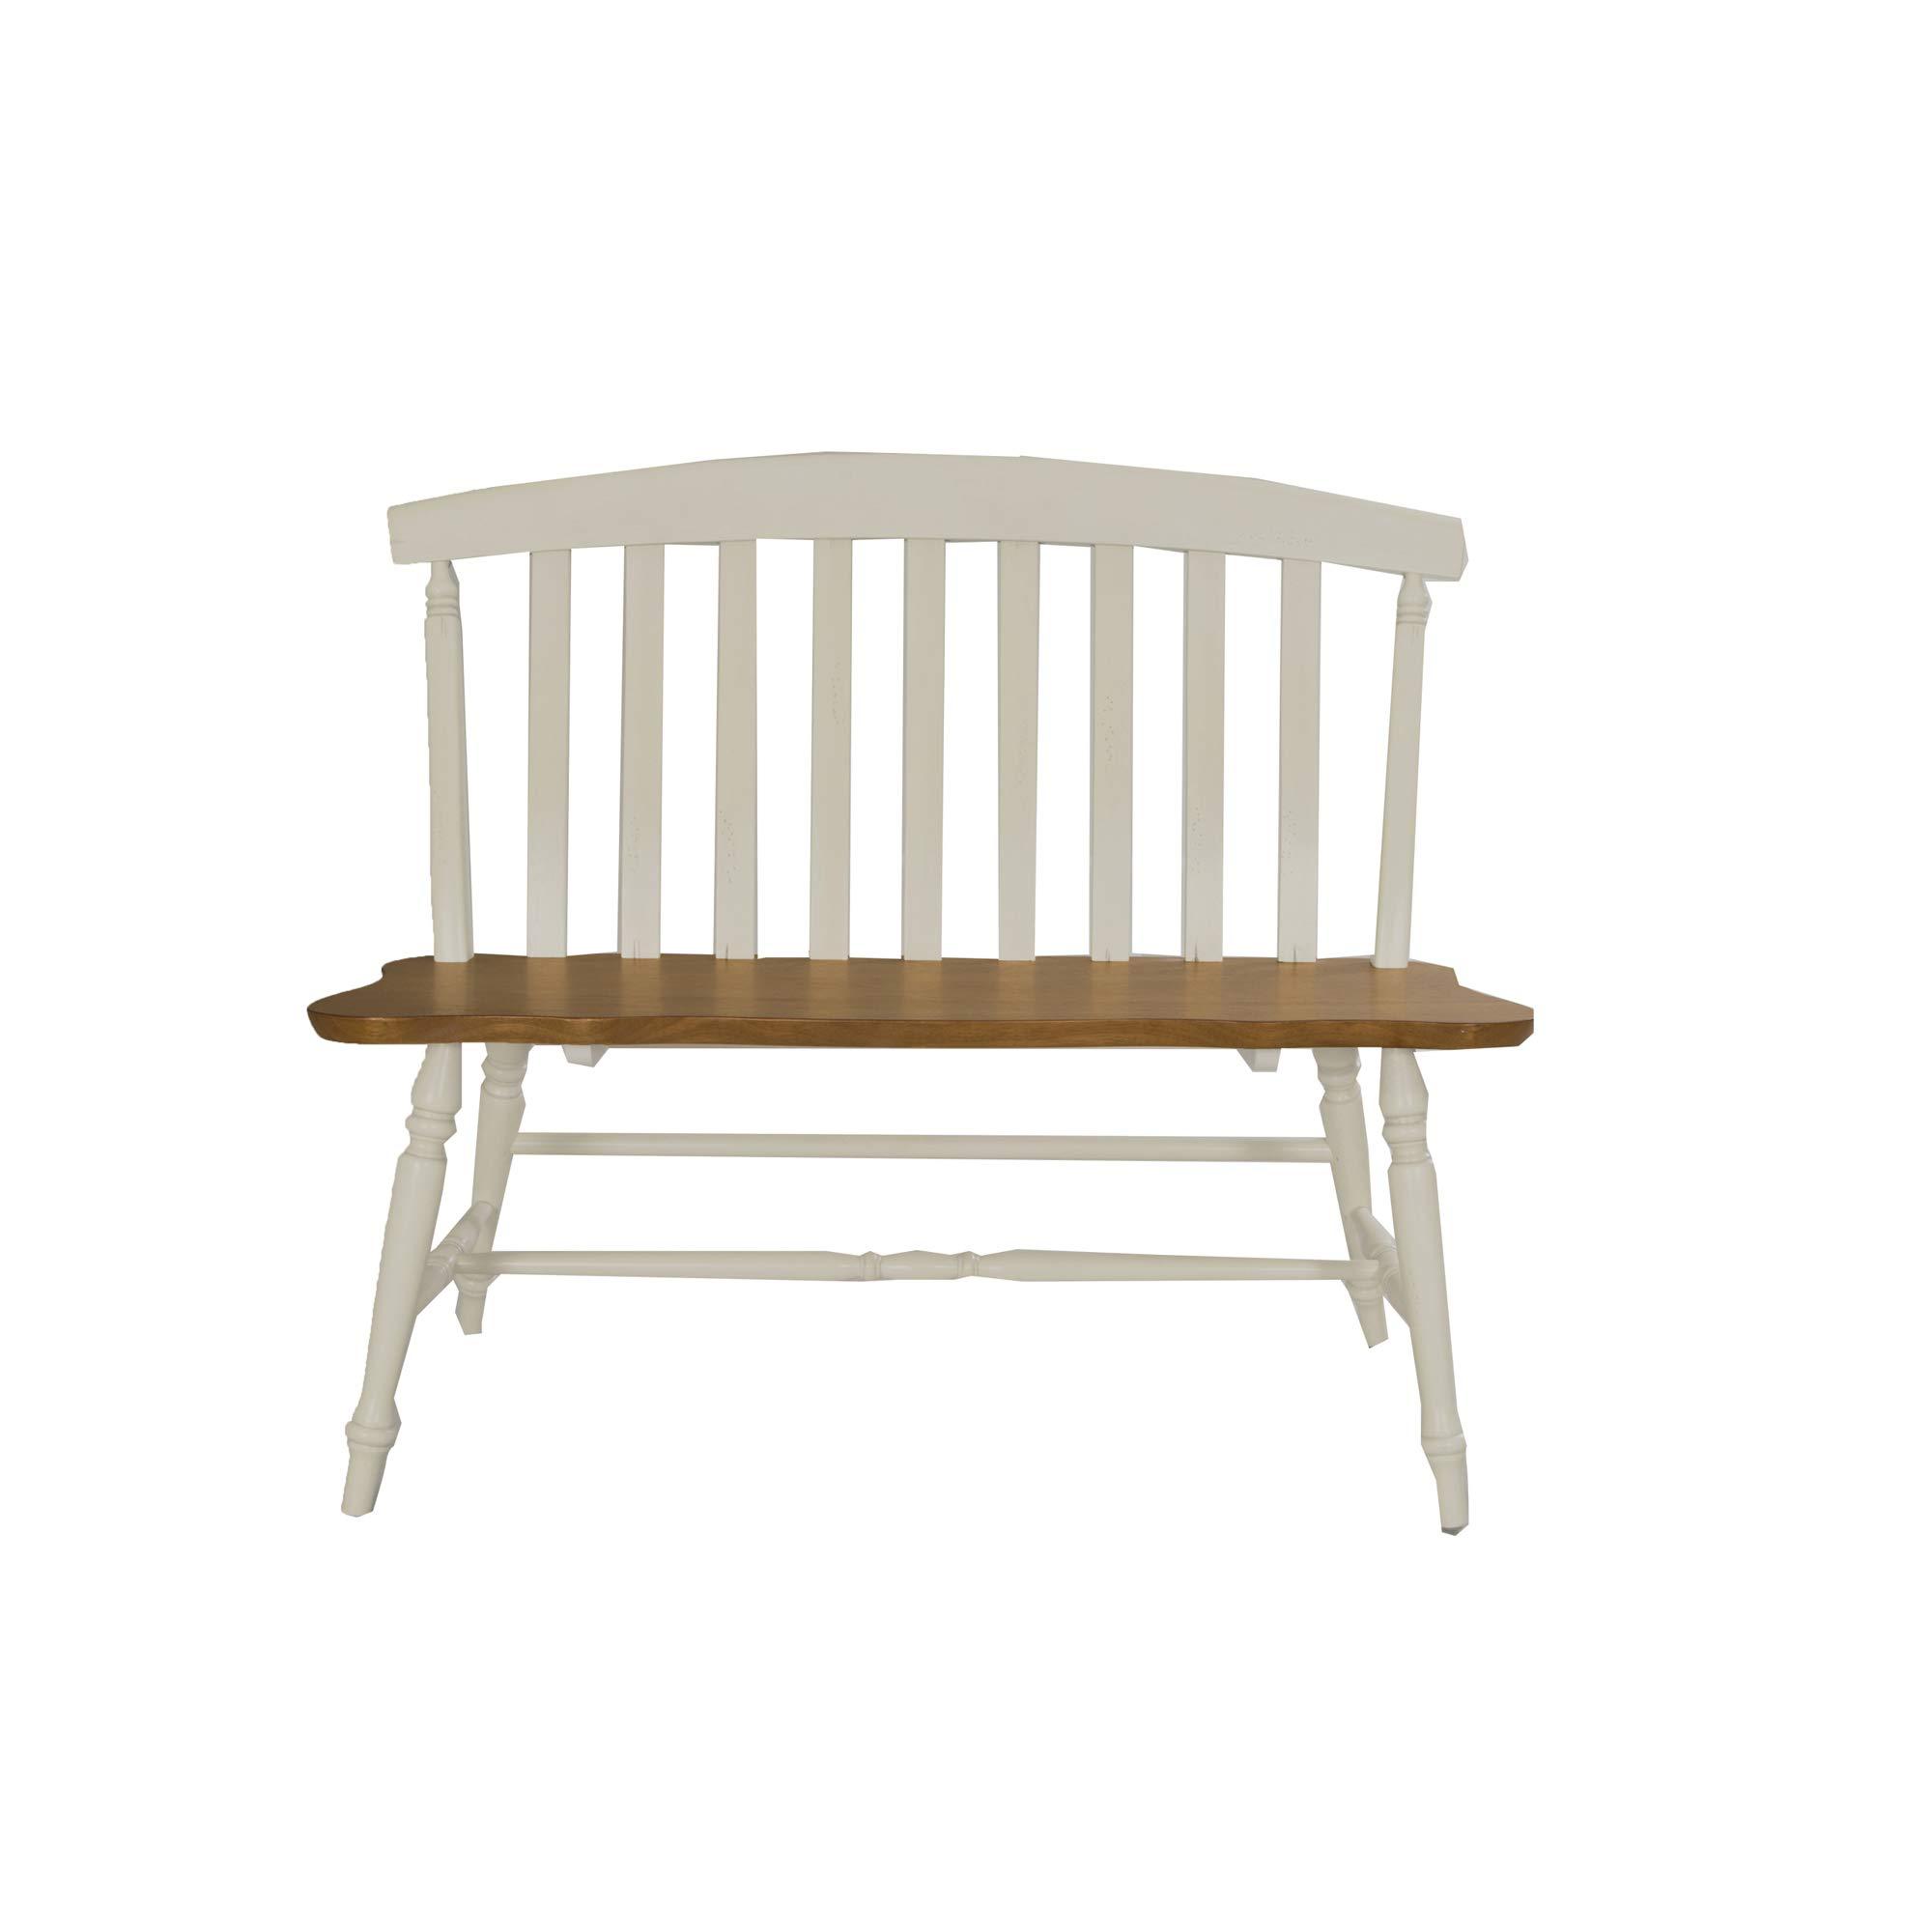 Liberty Furniture Industries Al Fresco III Slat Back Bench, 42'' x 18'' x 35'', Driftwood and Sand by Liberty Furniture INDUSTRIES